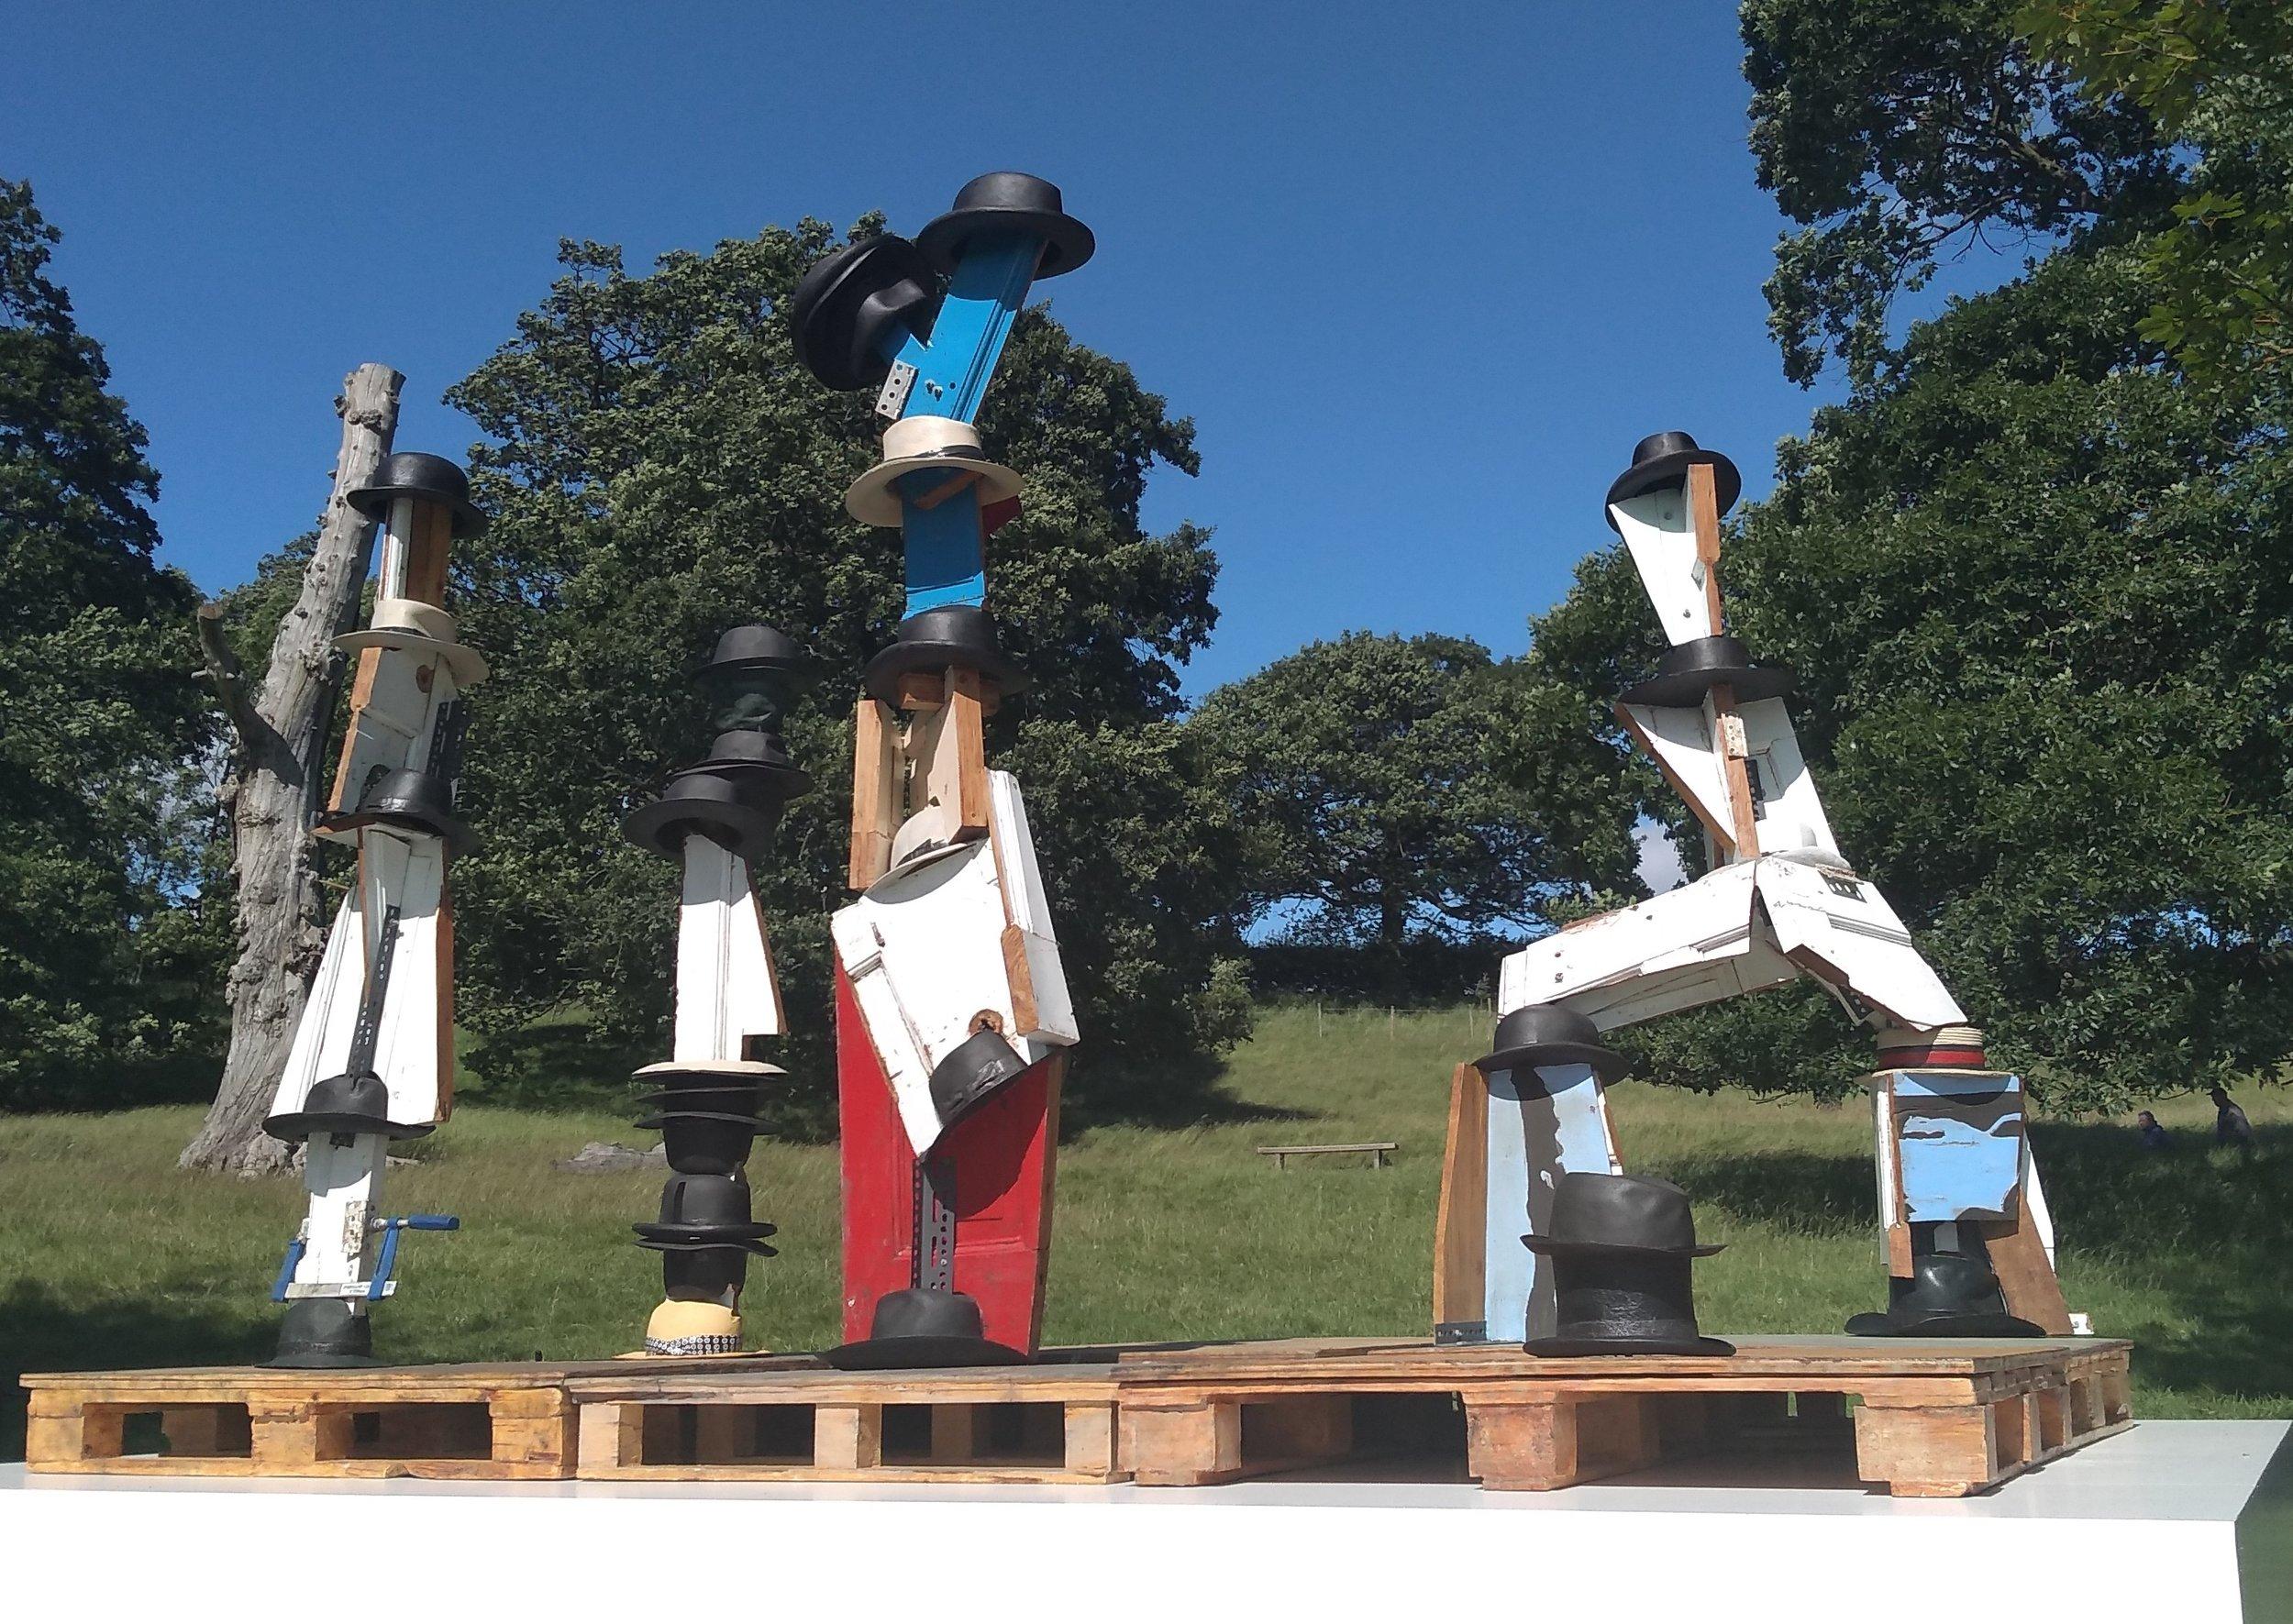 Damien Hirst - The Hat Makes The Man Yorkshire Sculpture Park